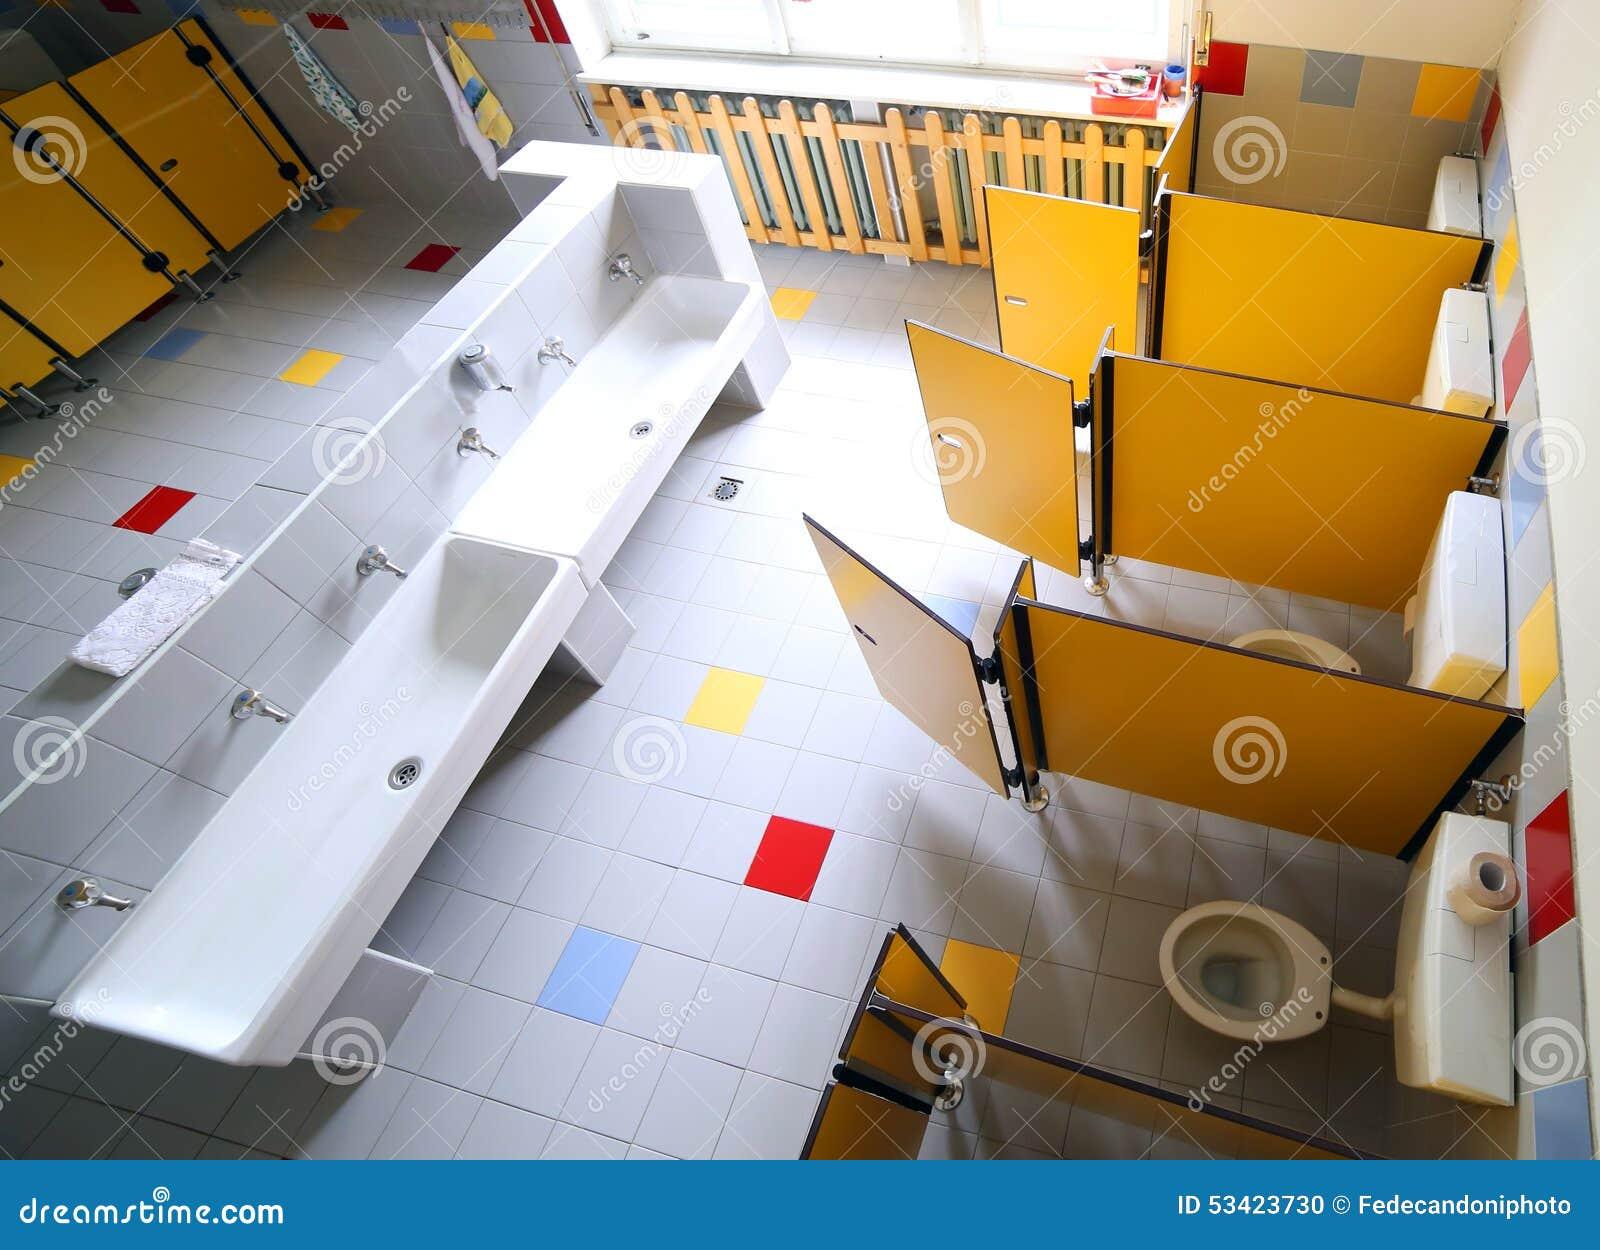 Kindergarten Bathroom With Washbasins And Cabins Stock Photo Image 53423730